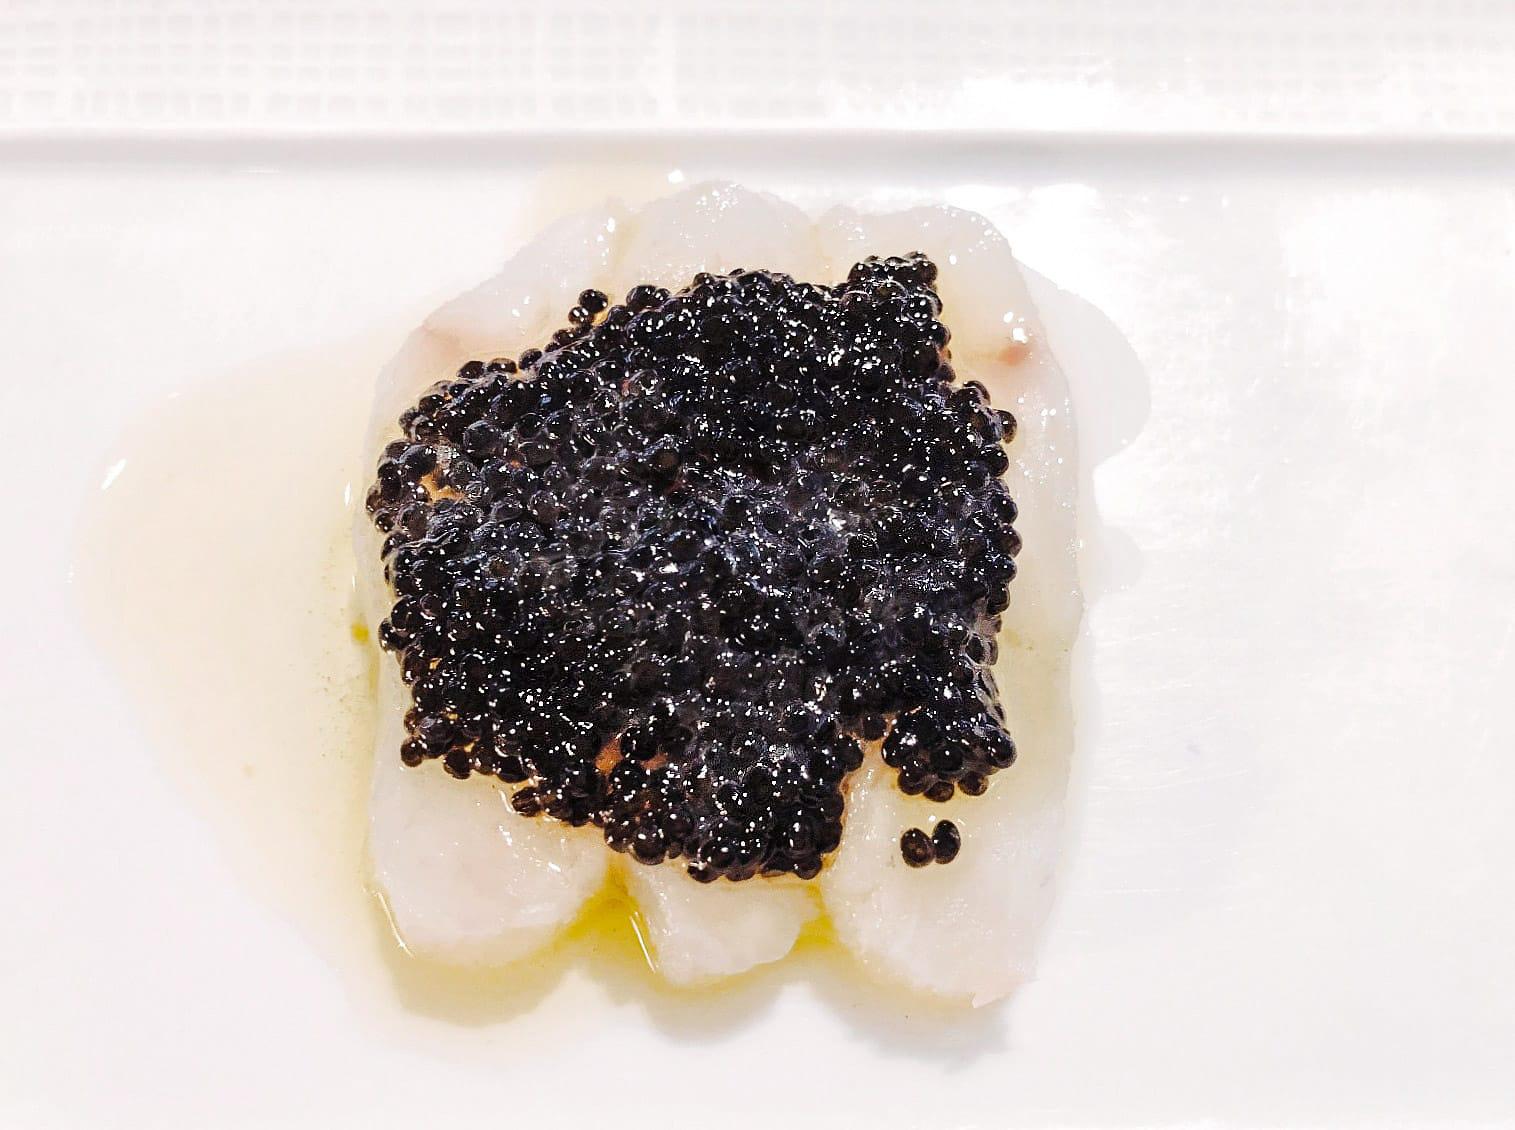 Crudo e Caviale - fluke crudo, american sturgeon caviar crème fraîche, meyer lemon